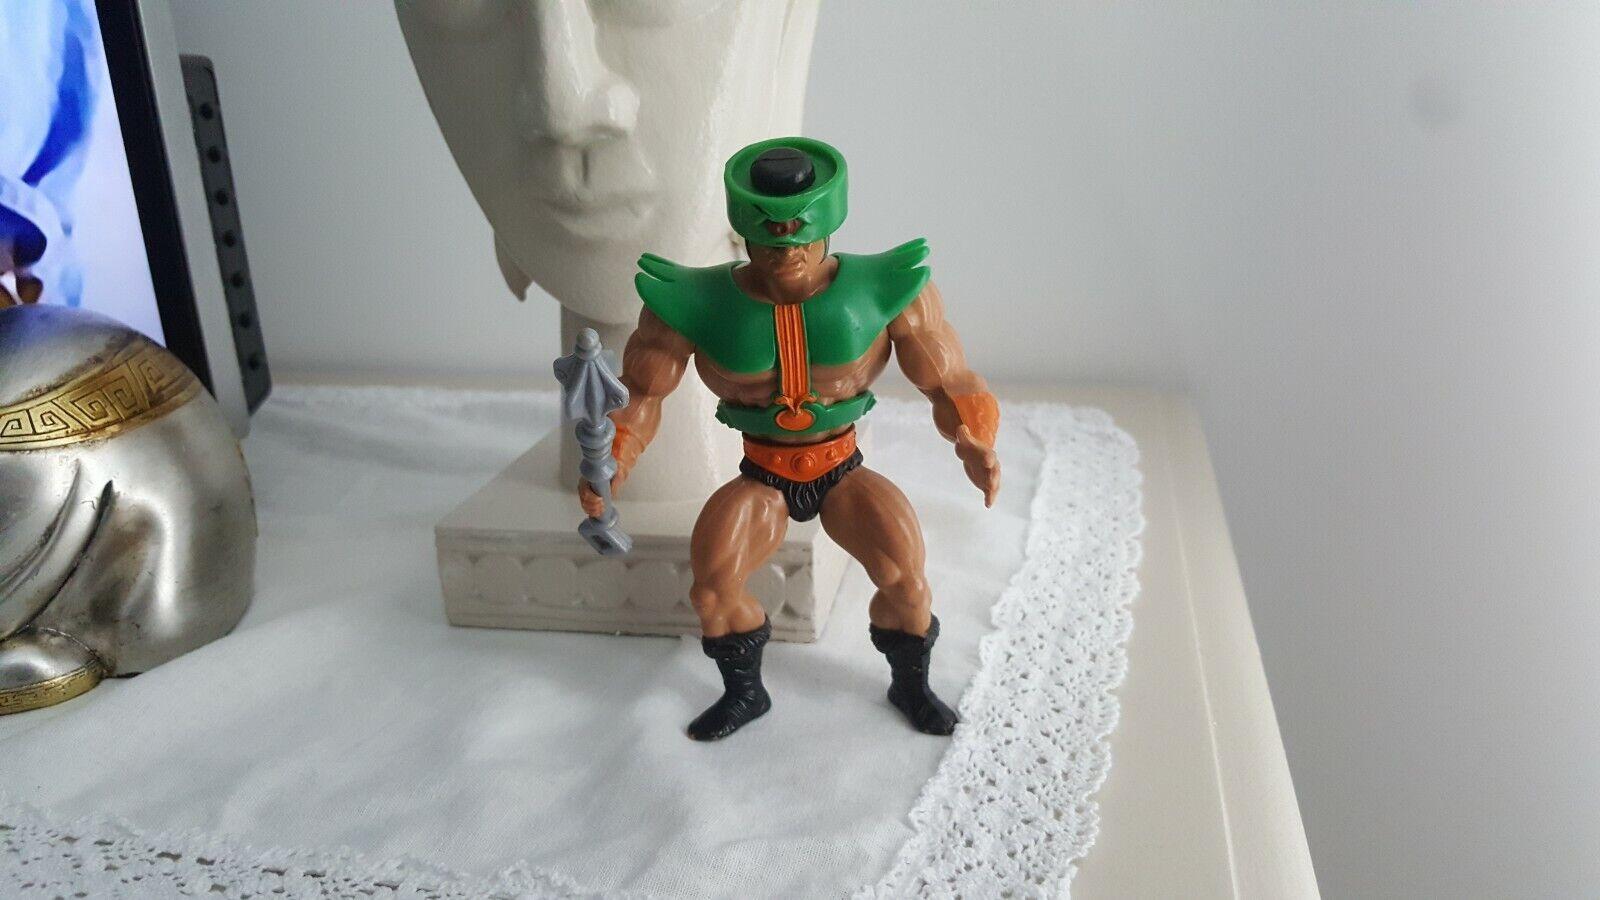 He man Vintage He-Man MOTU Figure - TRI-KLOPS (1981) good good good armor and weapon 0ef251